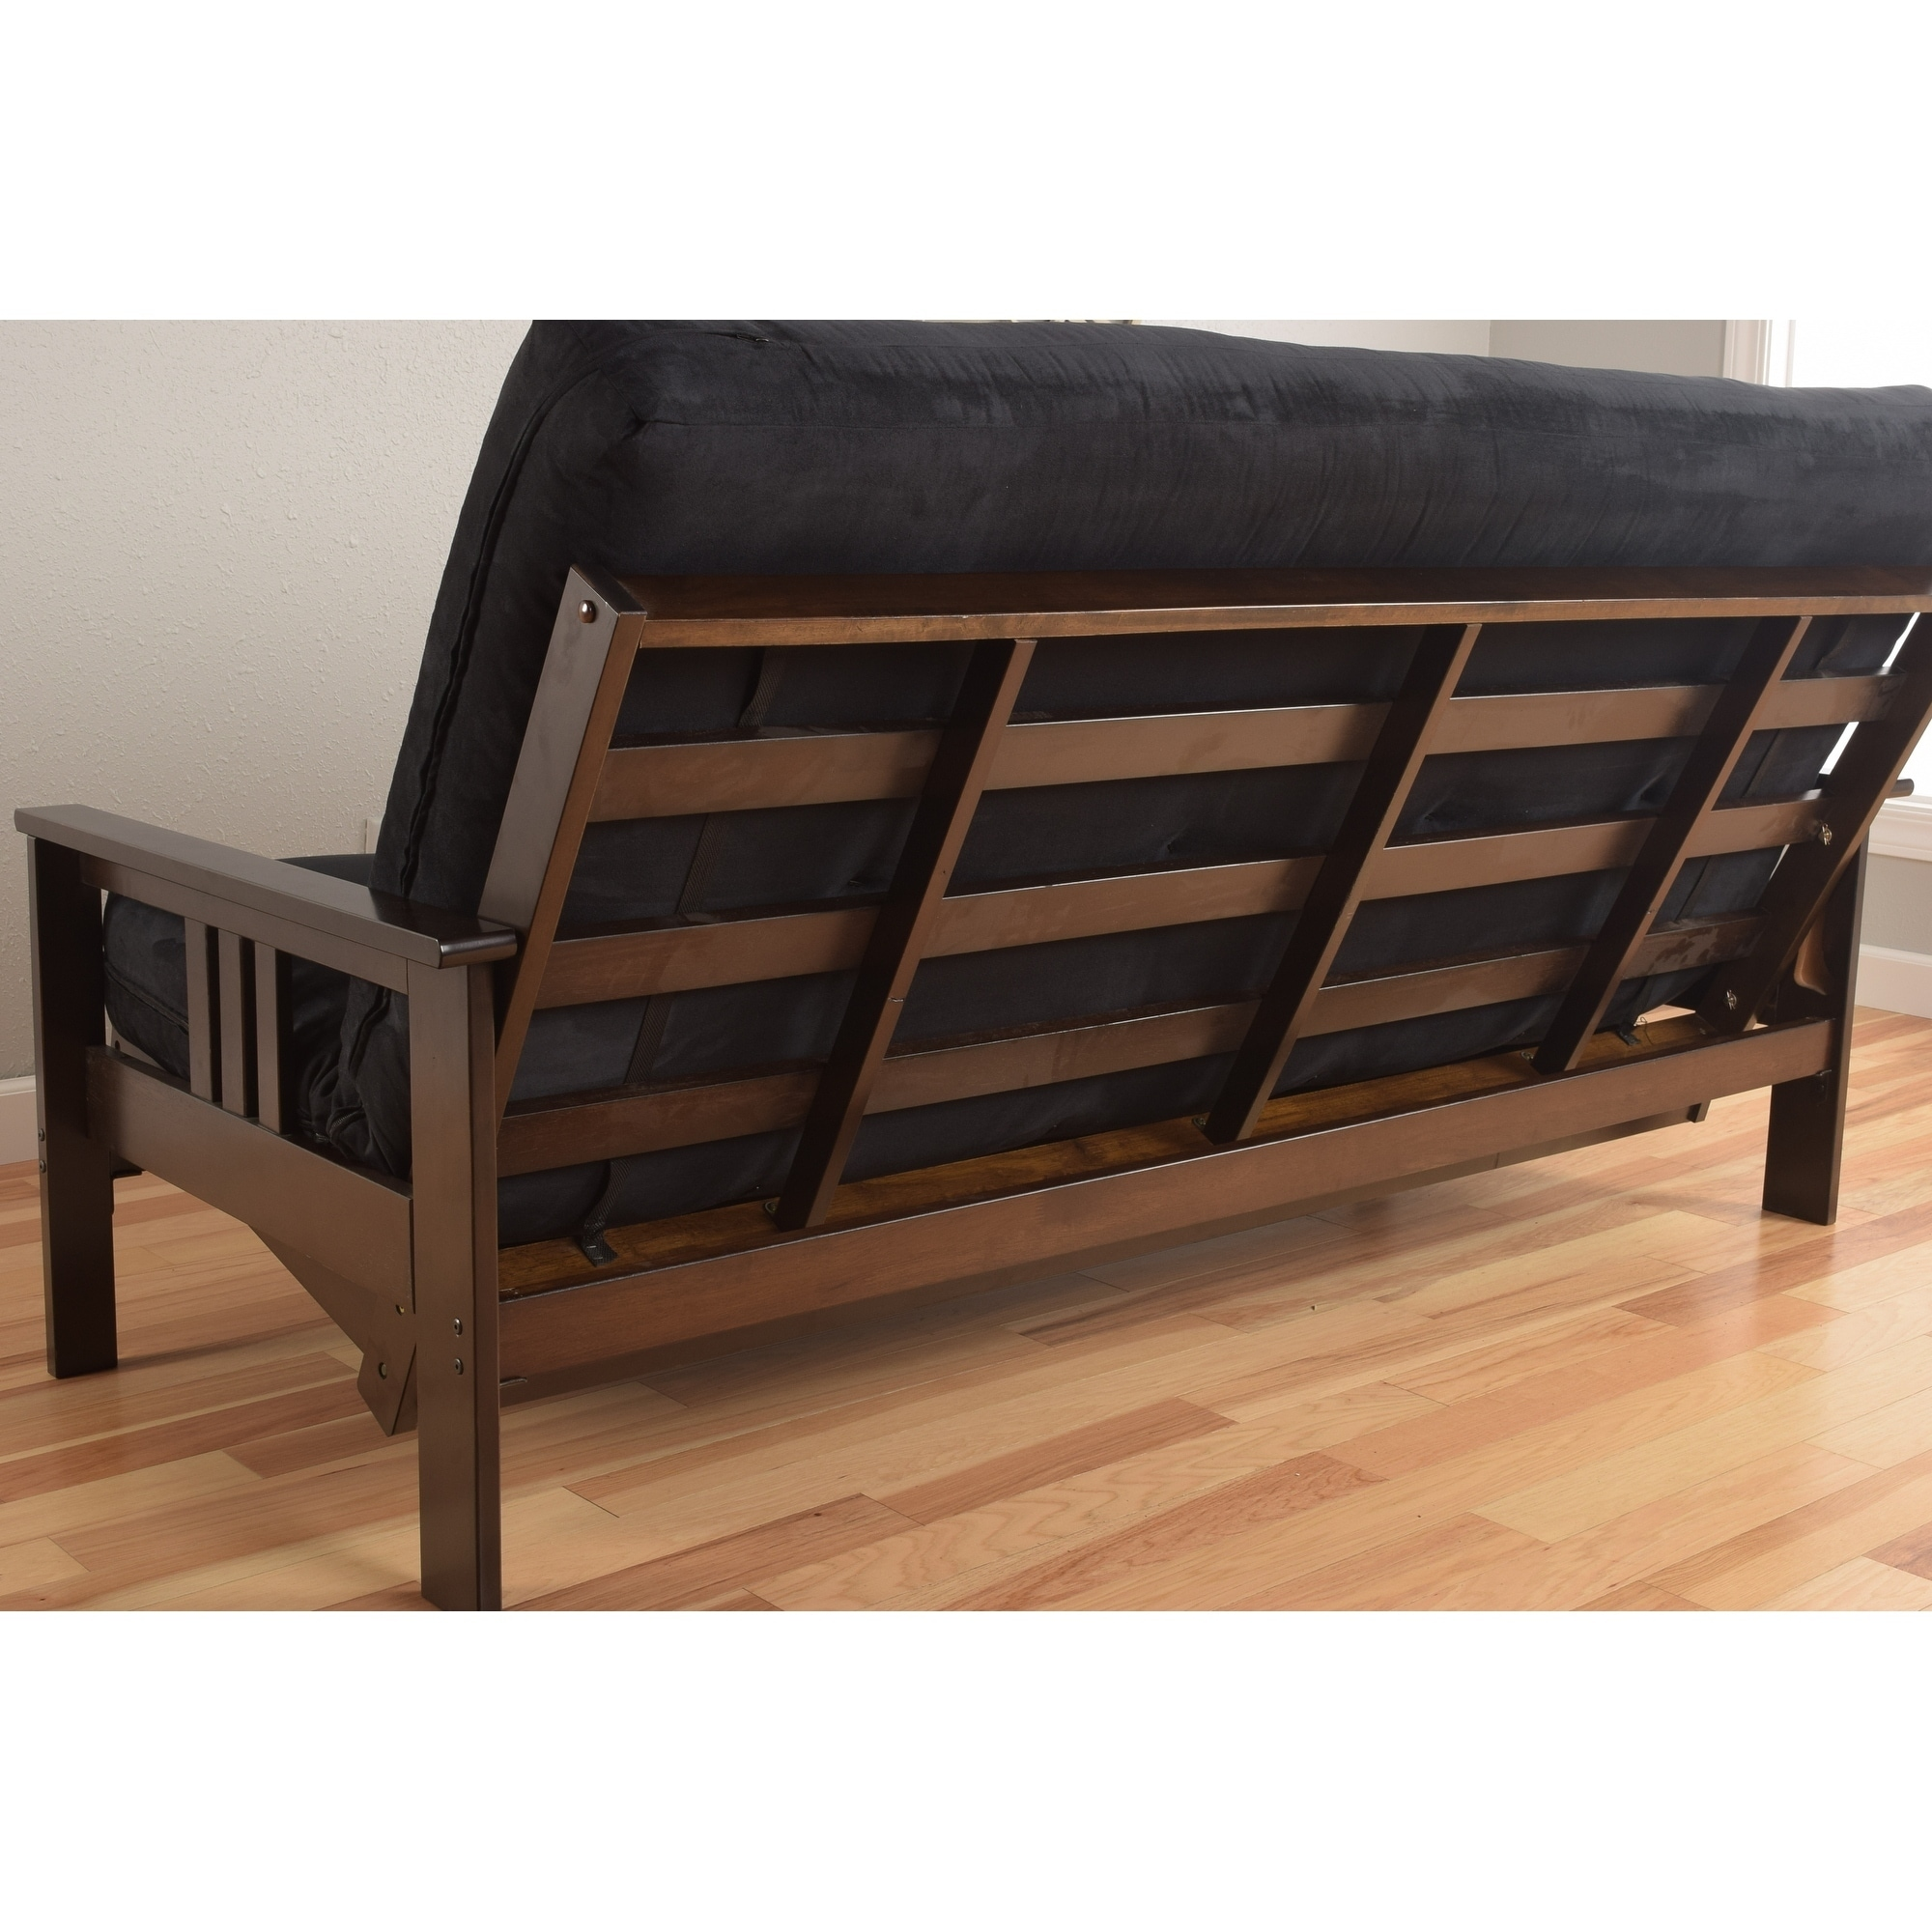 Porch Den Desoto Hardwood Suede Queen Size Futon Sofa Bed